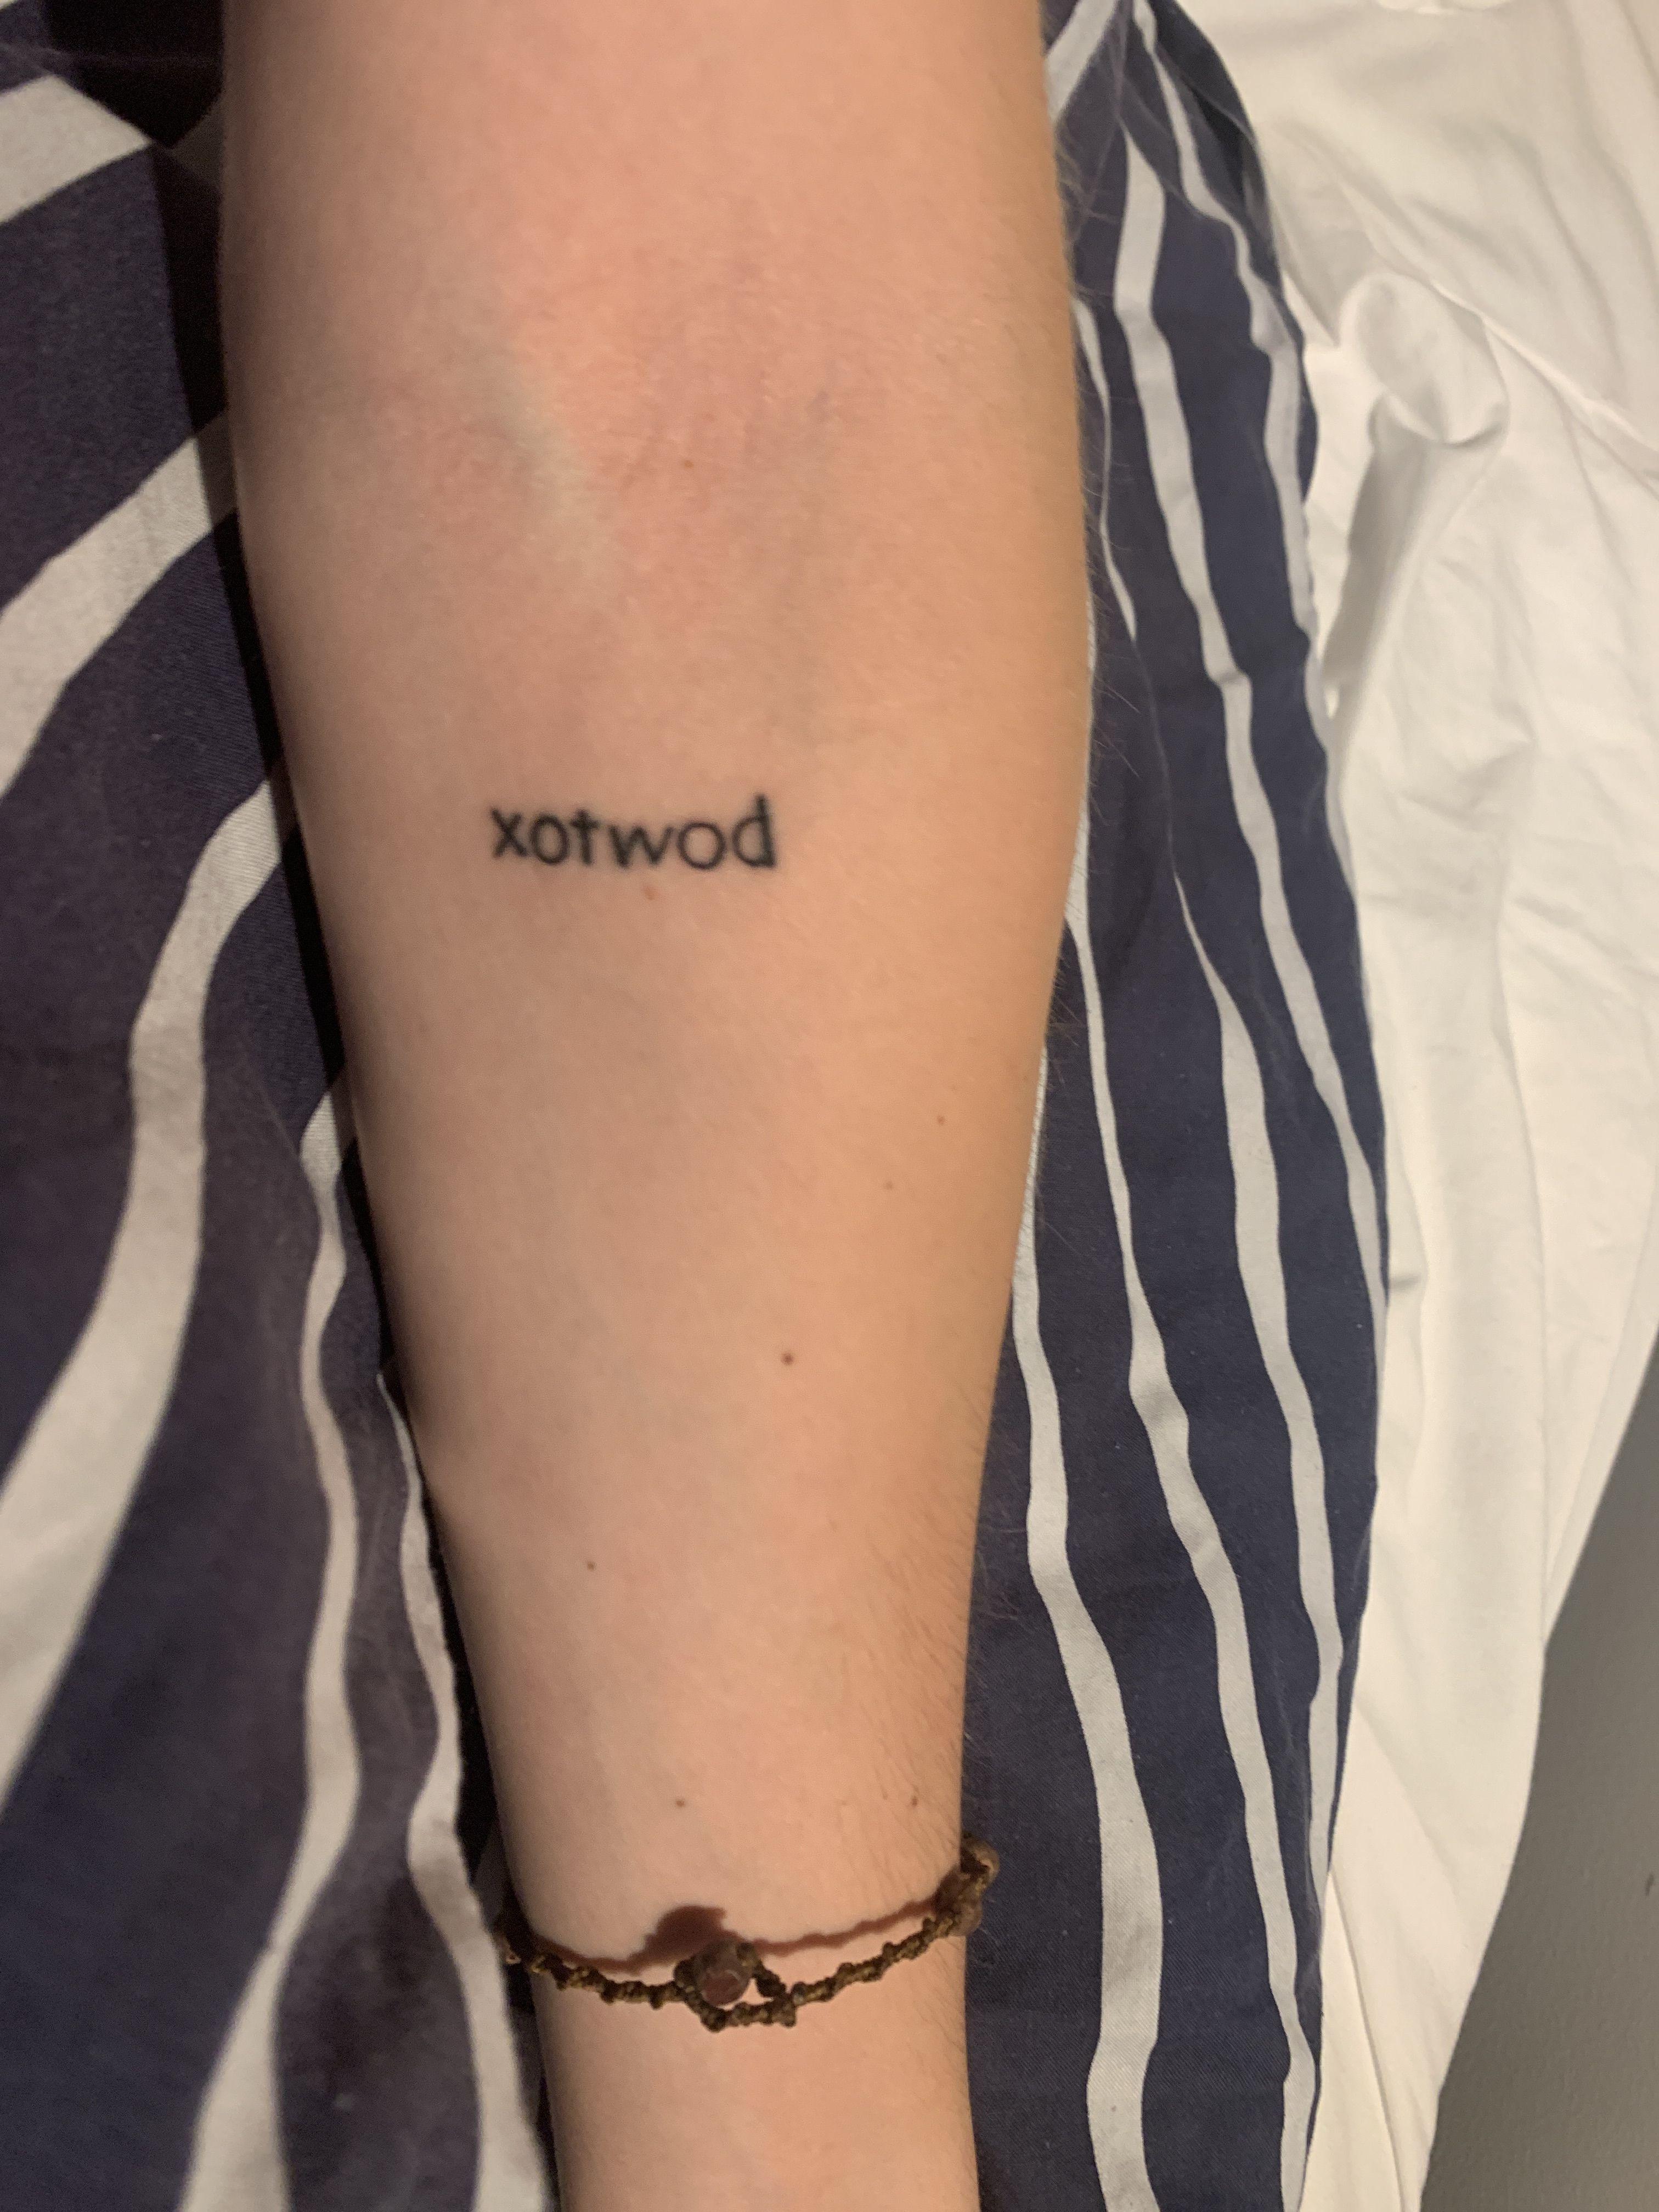 Theweeknd In 2020 Xo Tattoo The Weeknd Tattoo Hip Thigh Tattoos